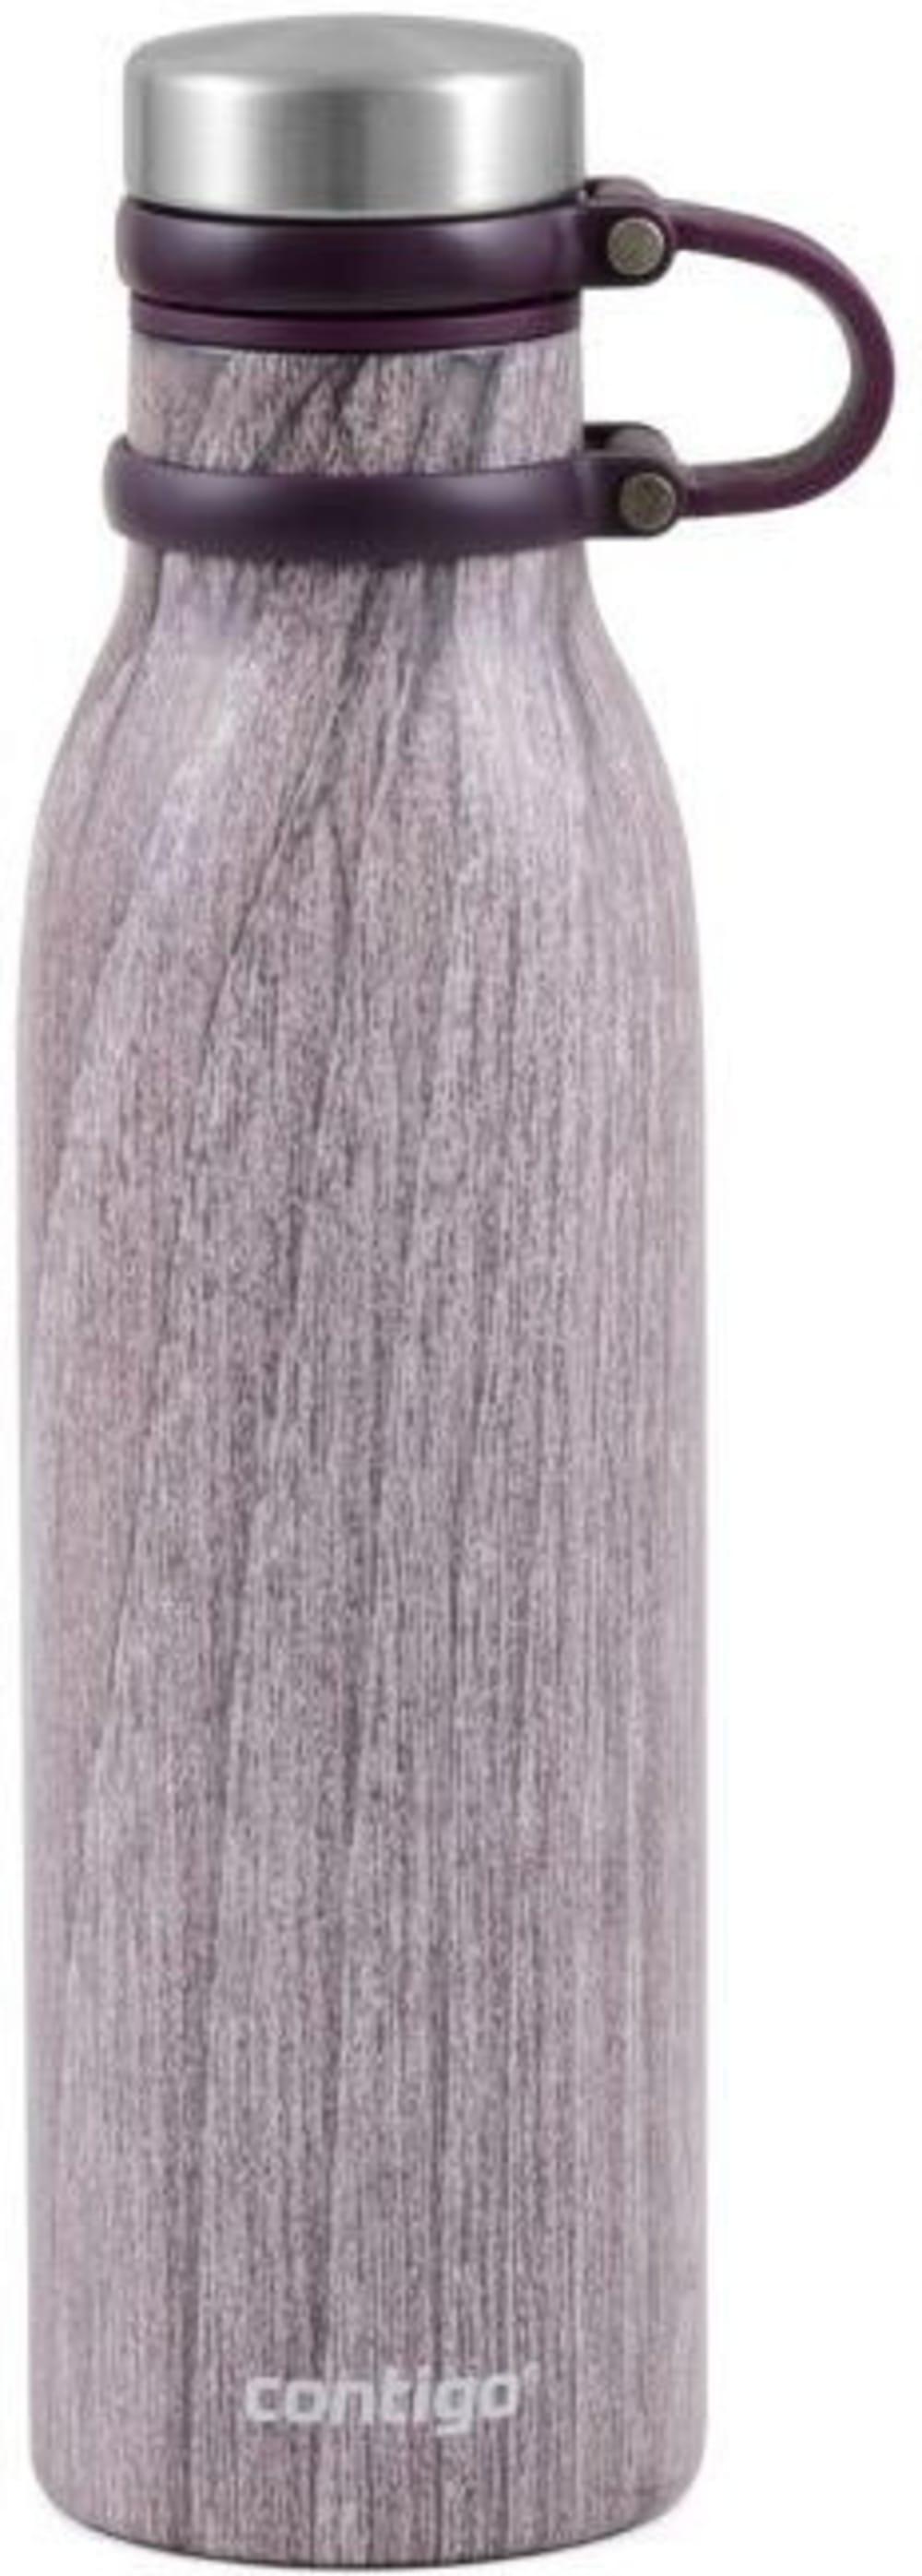 Butelka Matterhorne Couture Vacuum Insulated blonde wood 590 ml